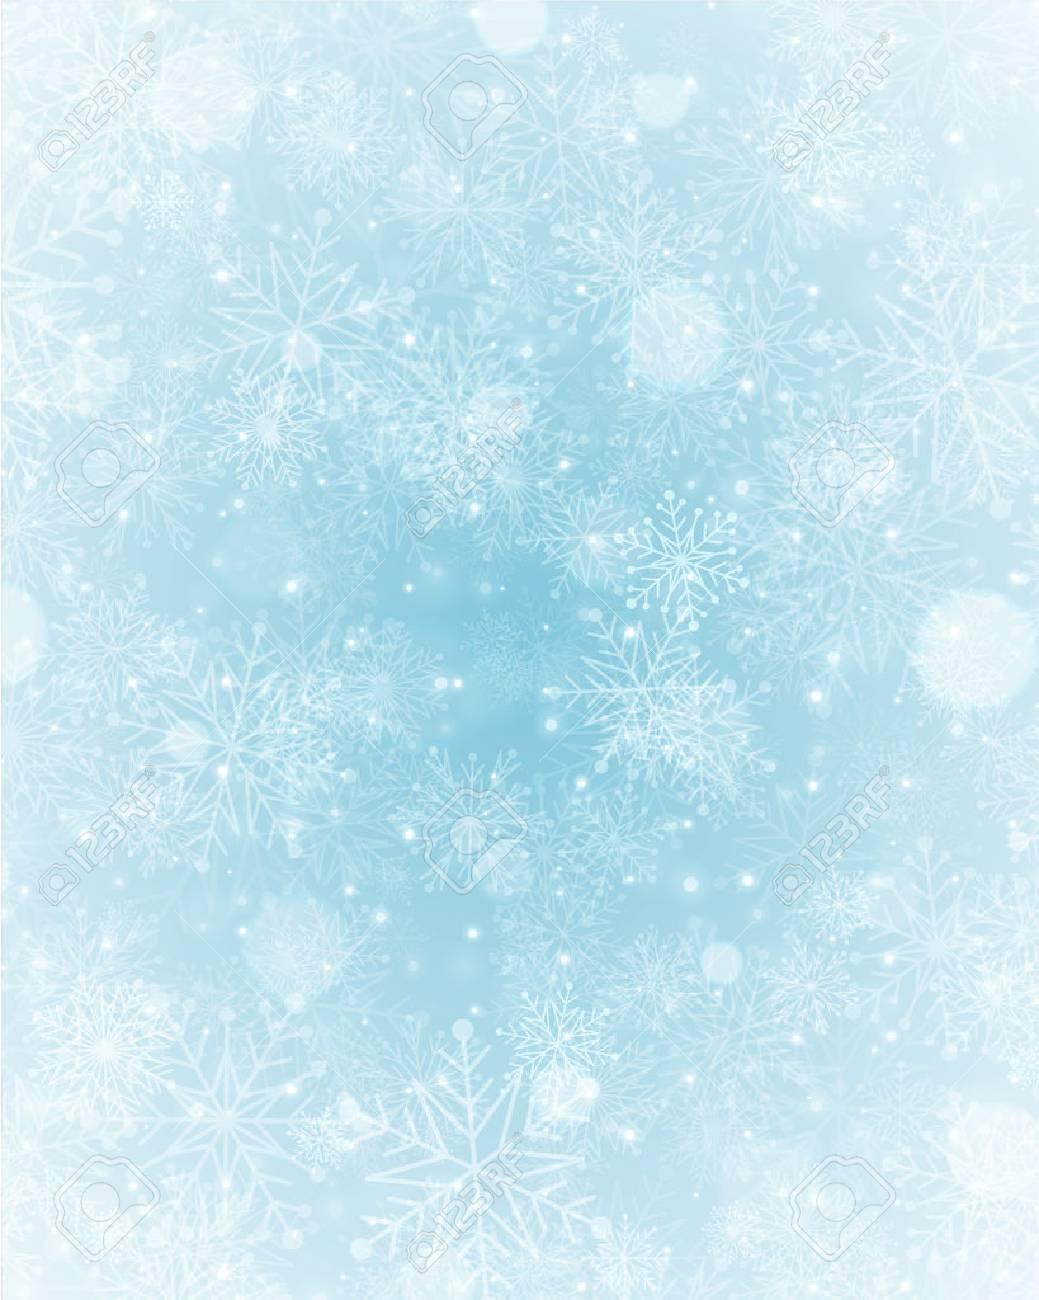 Christmas light with snowflakes. Merry Christmas holidays wish greeting card. - 32769176